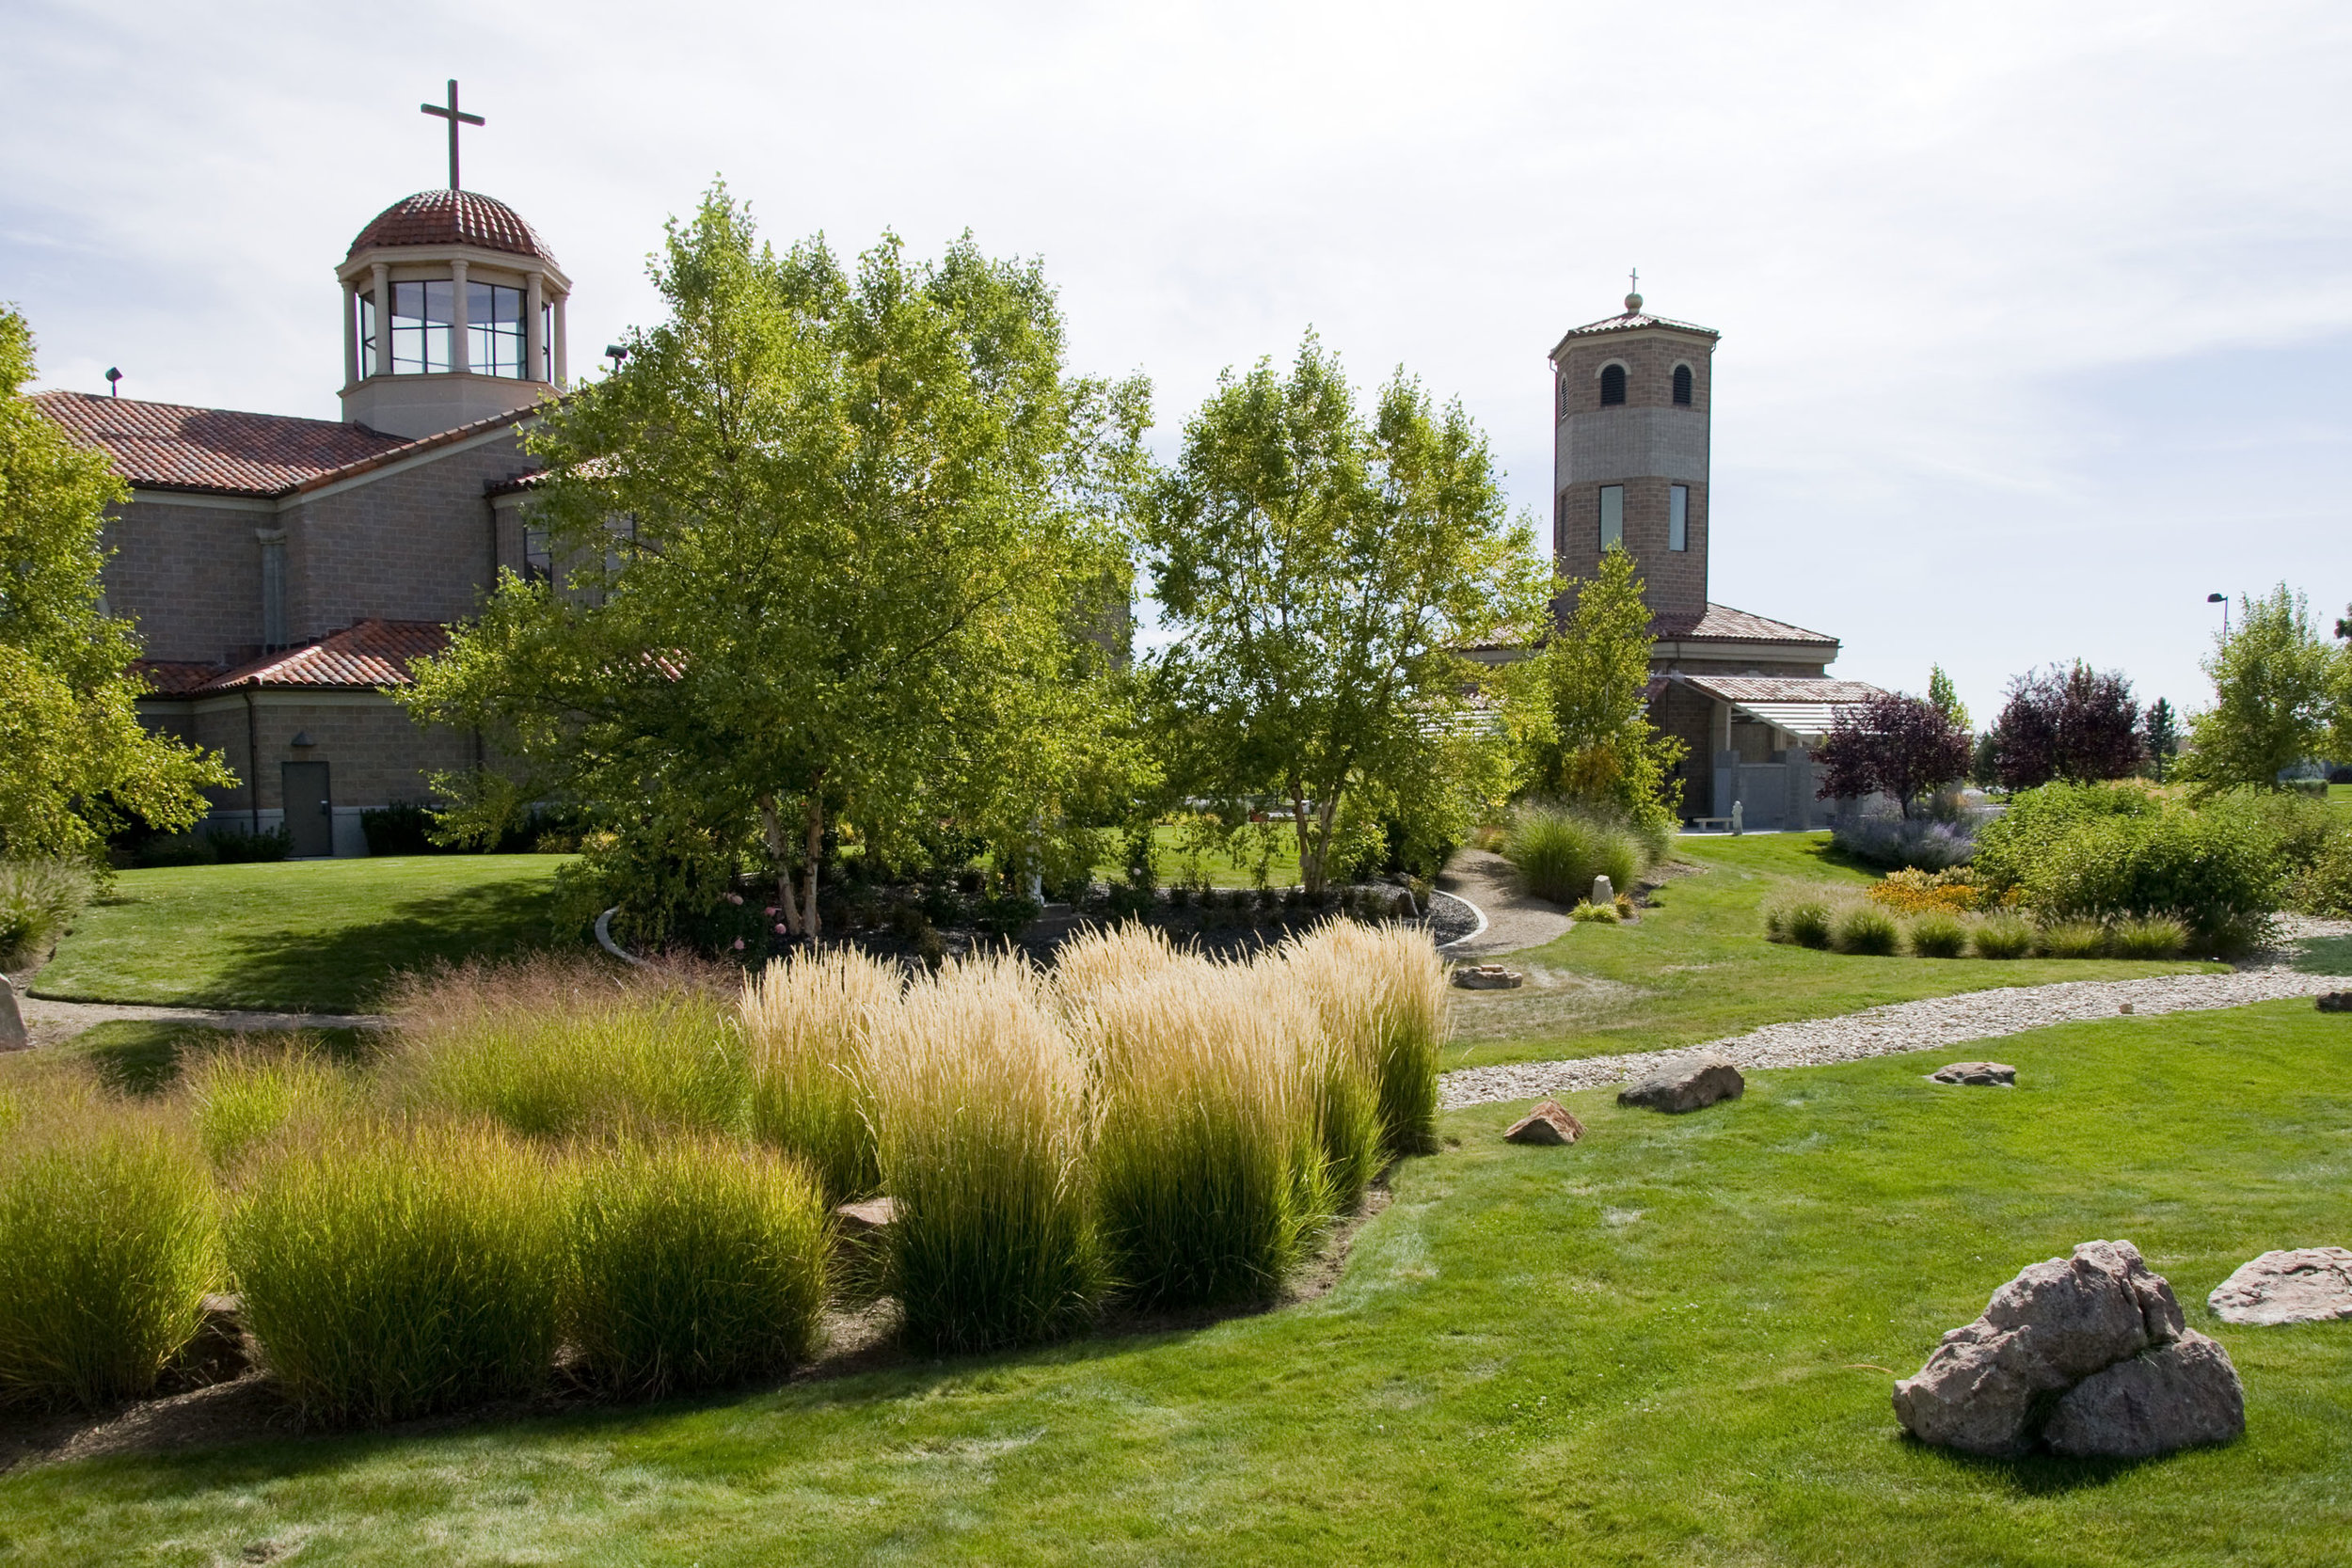 Holy Apostles Catholic Church